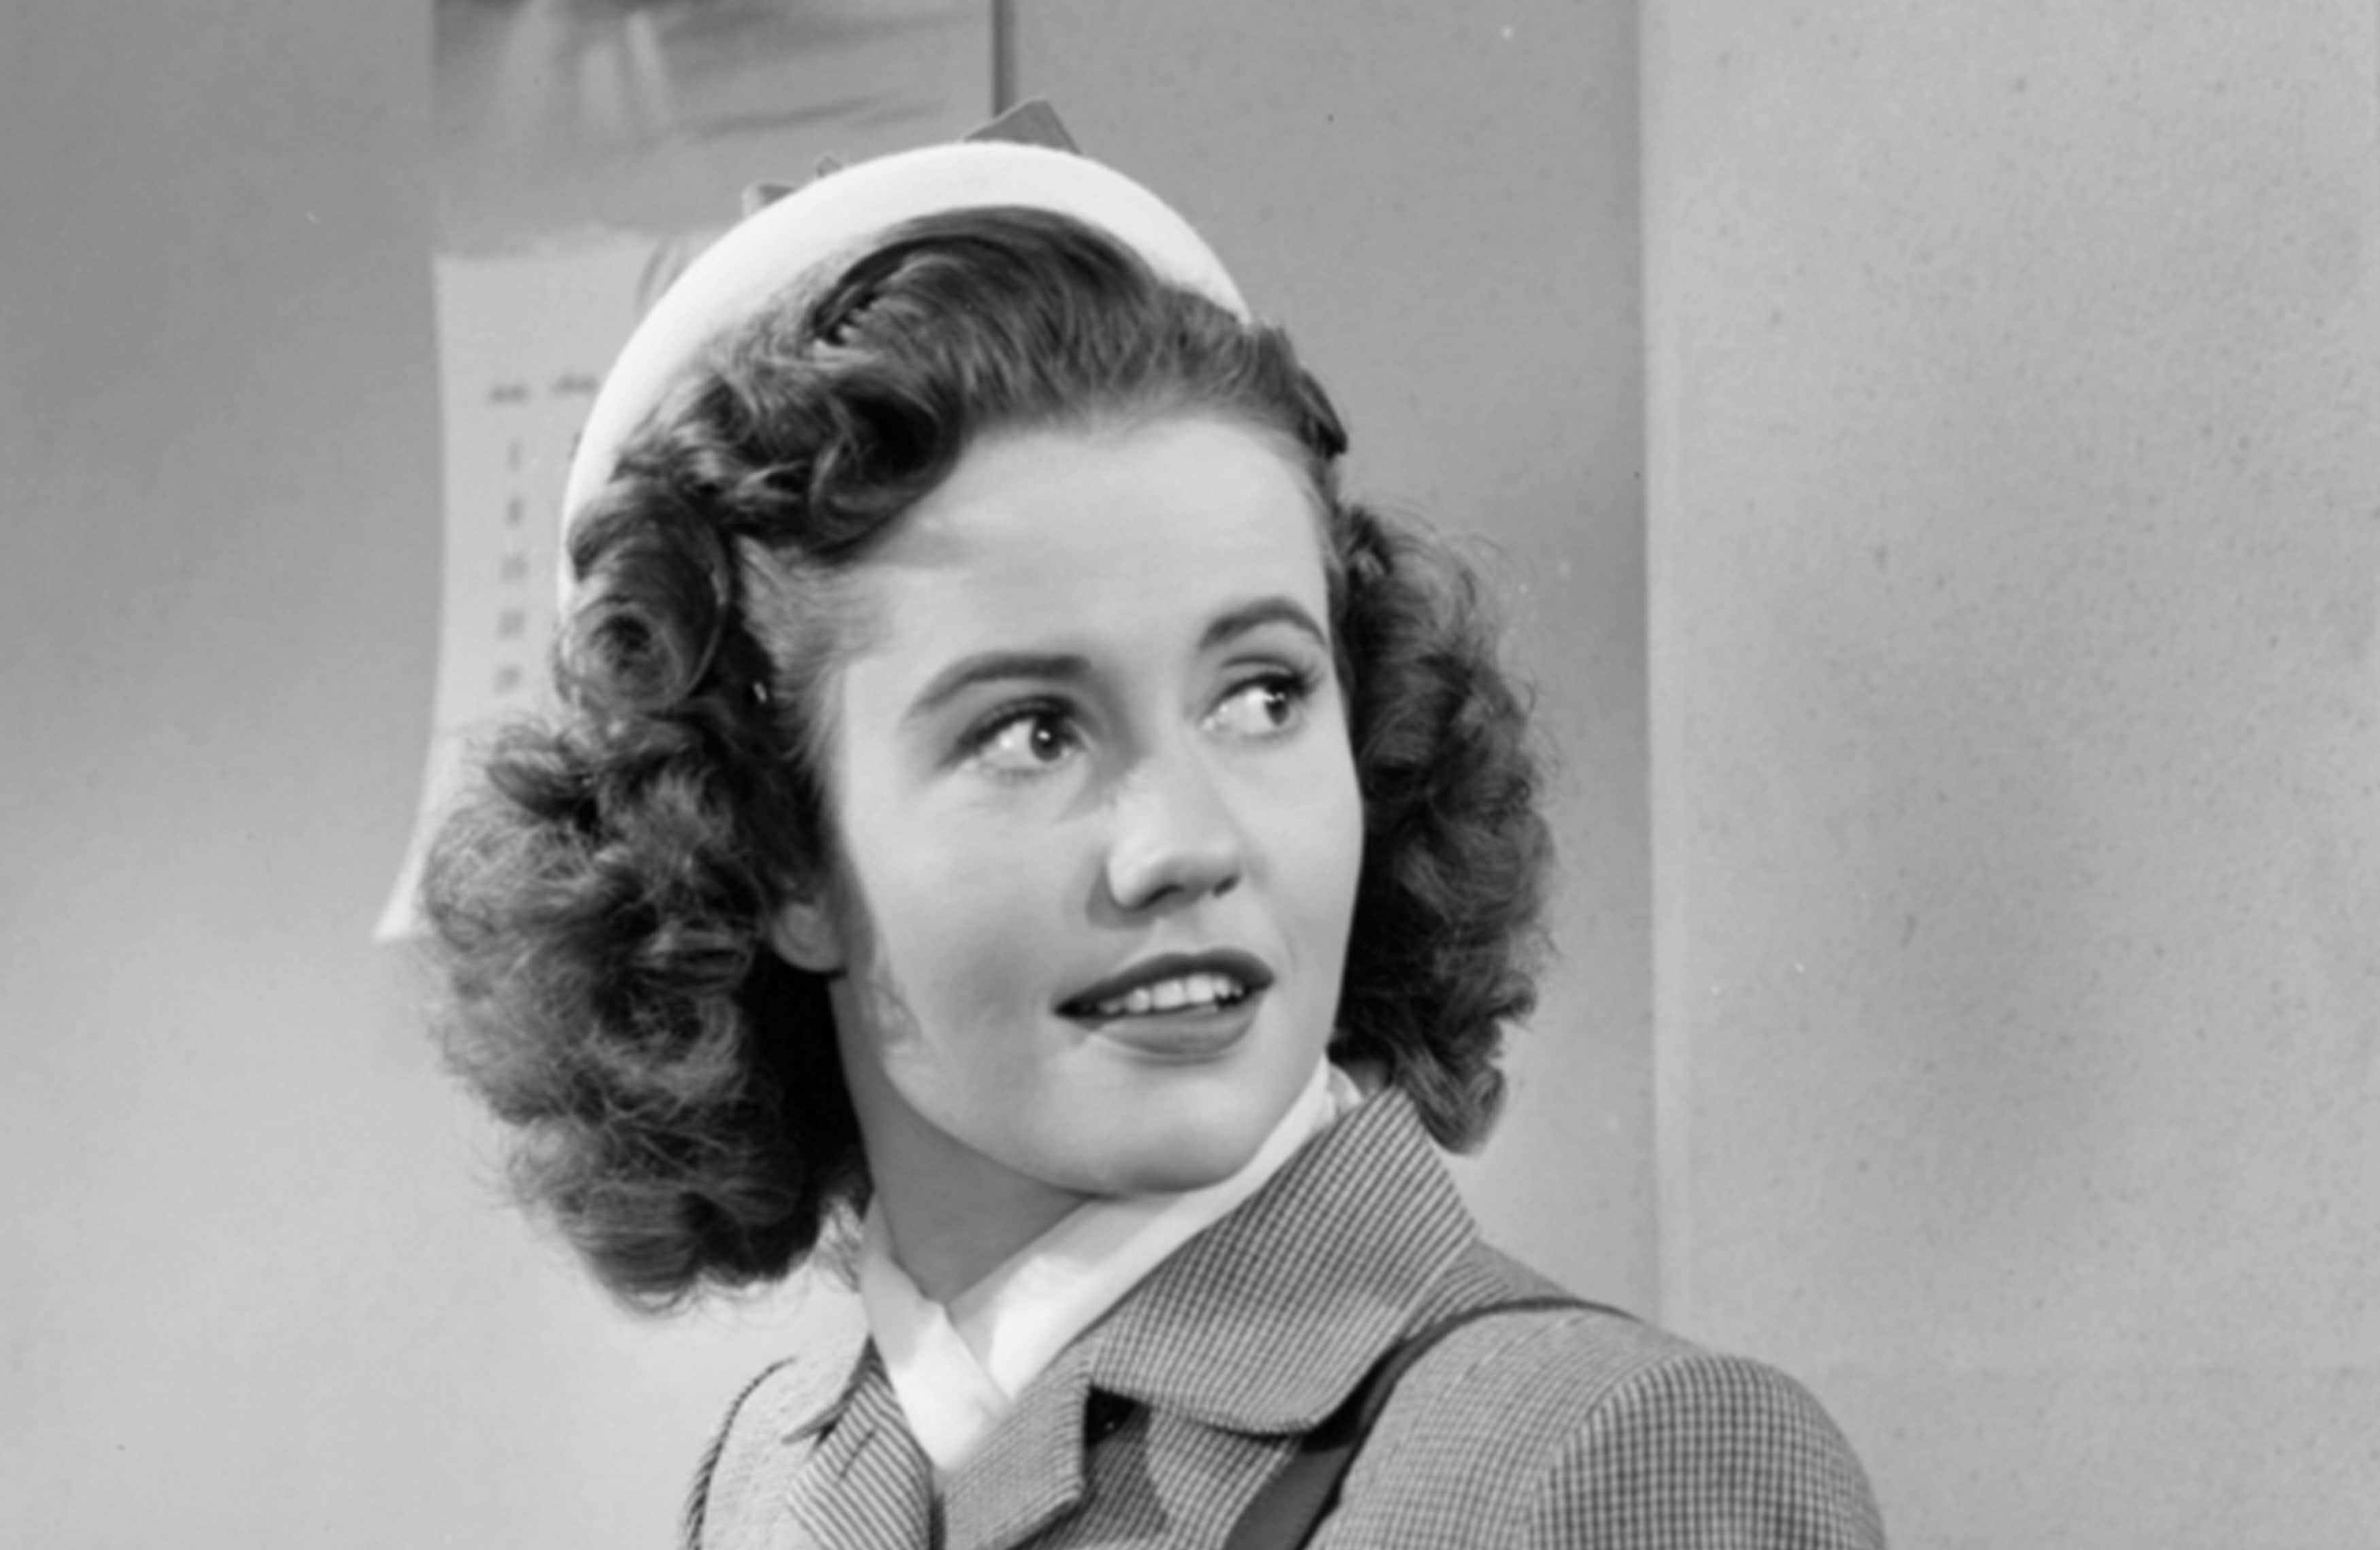 Joyce Reynolds